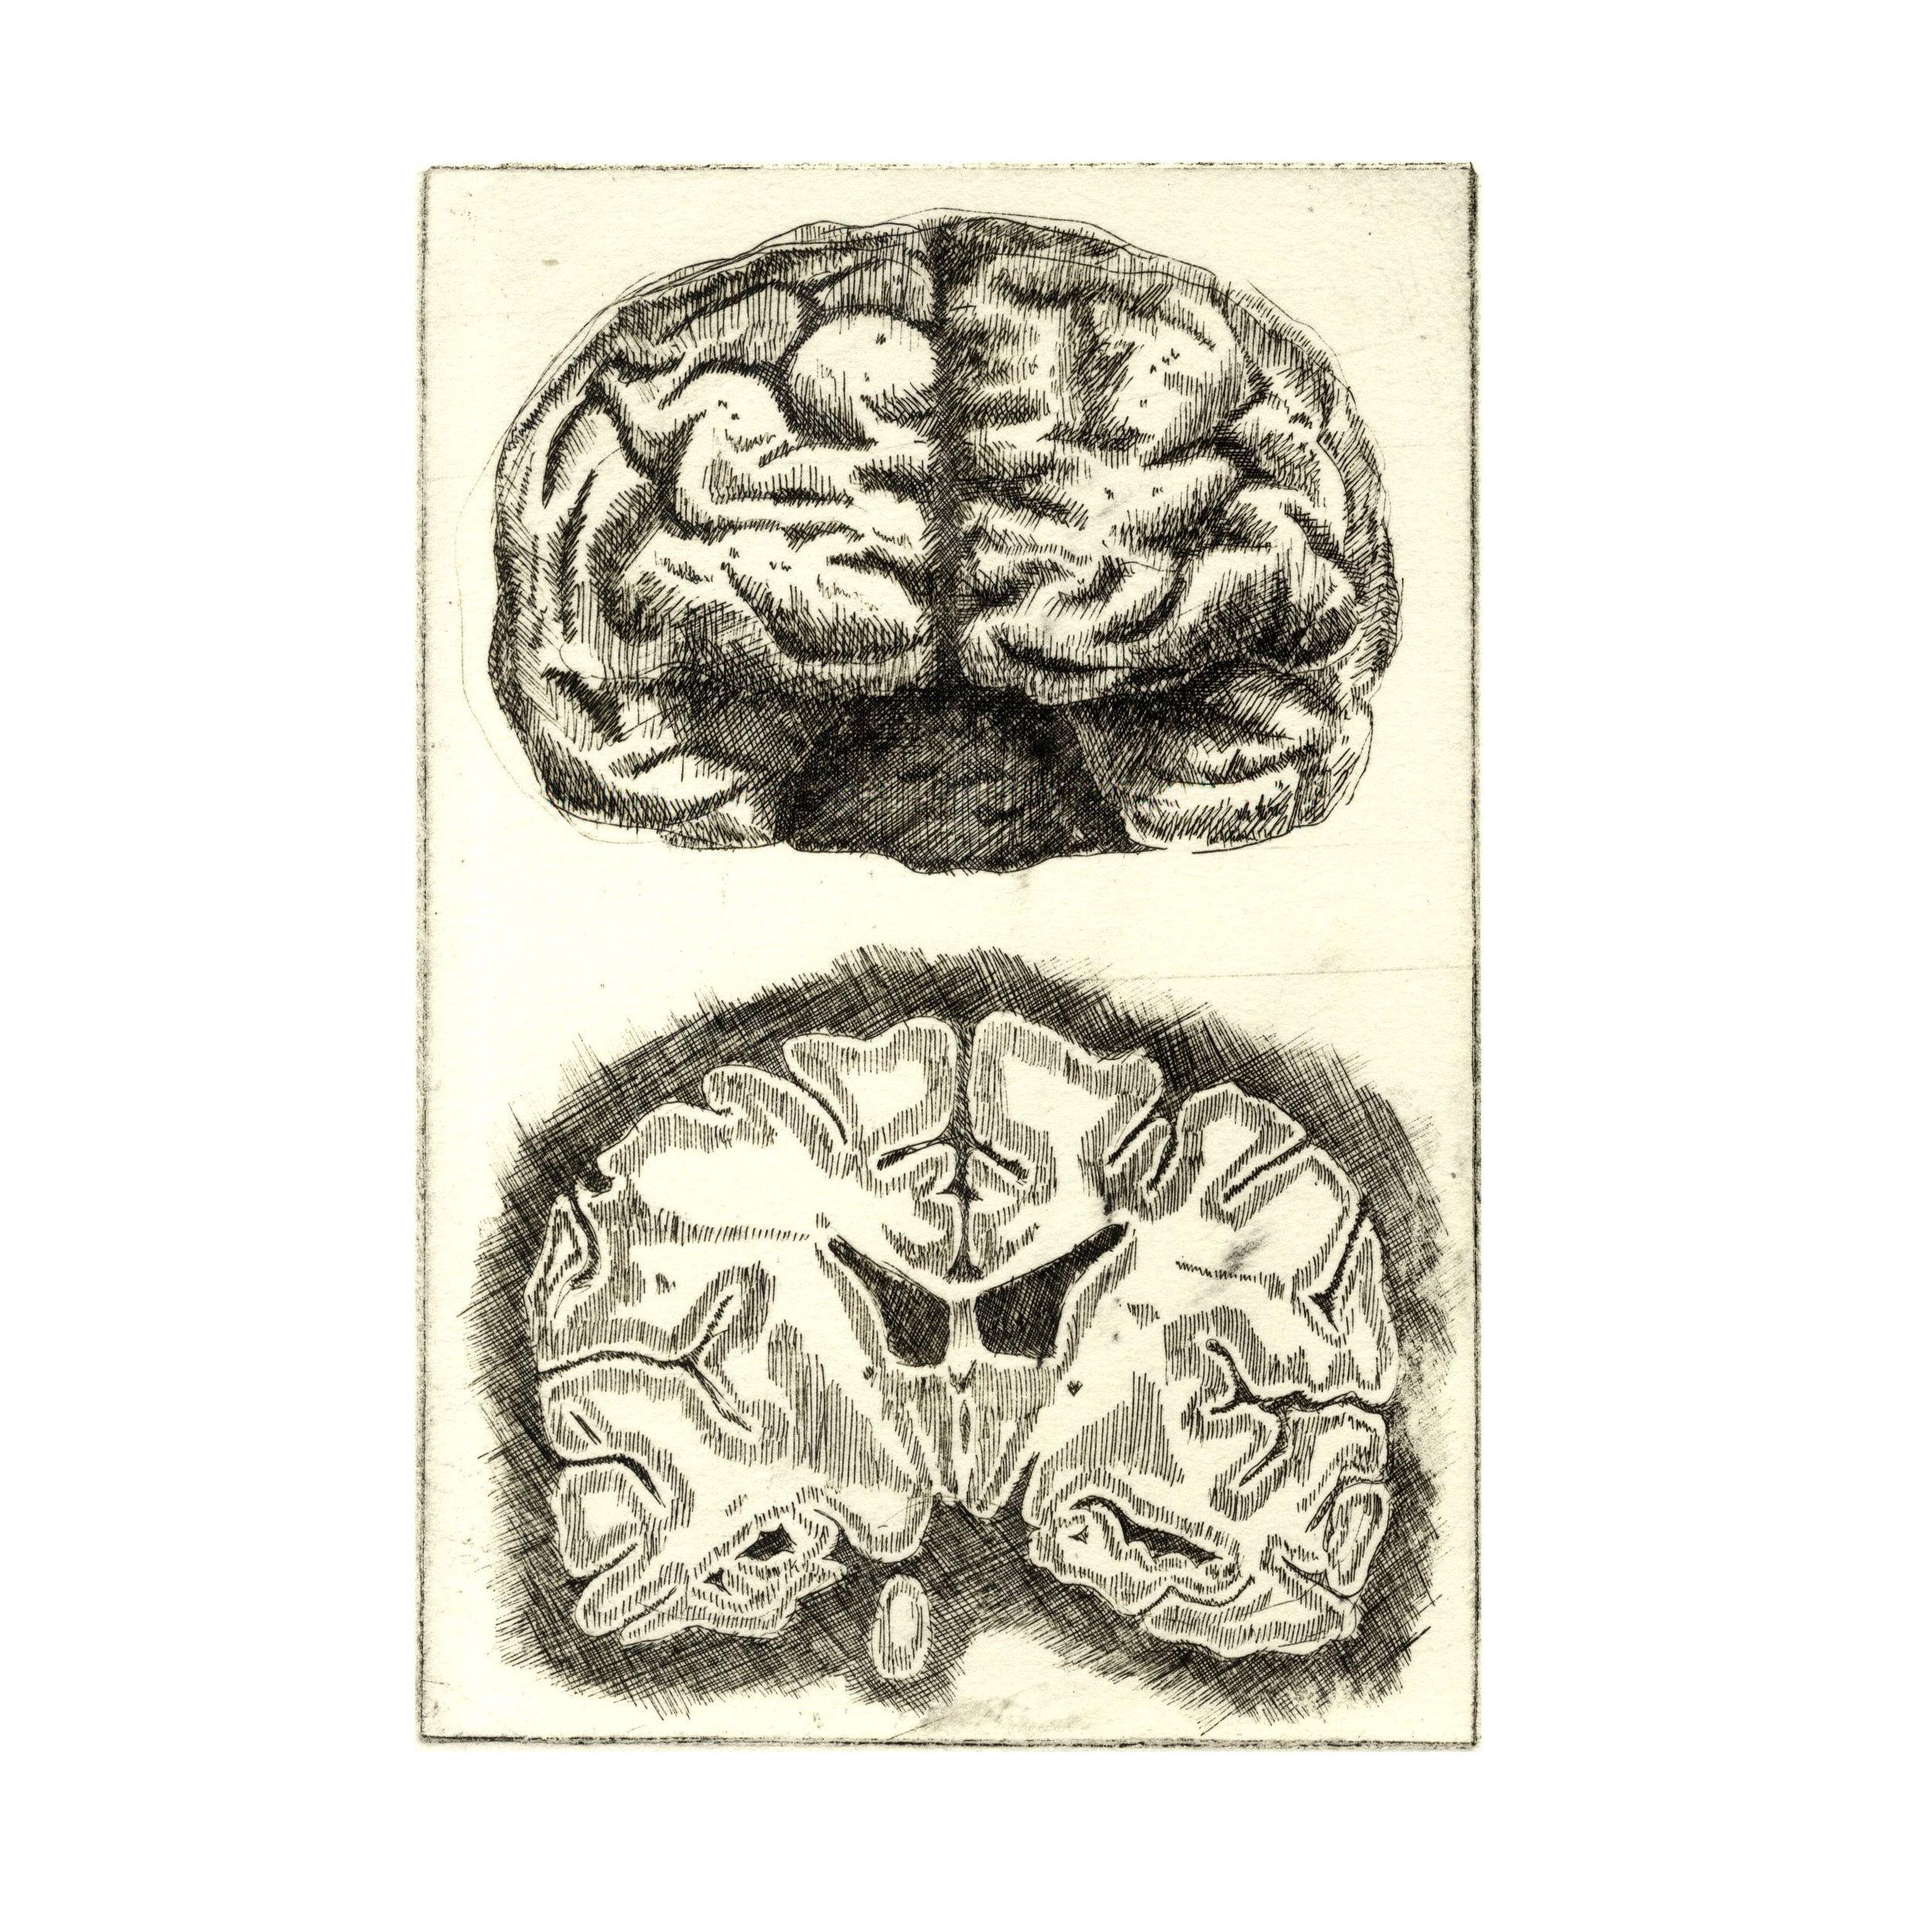 'Anatomical Study- Brain 1'